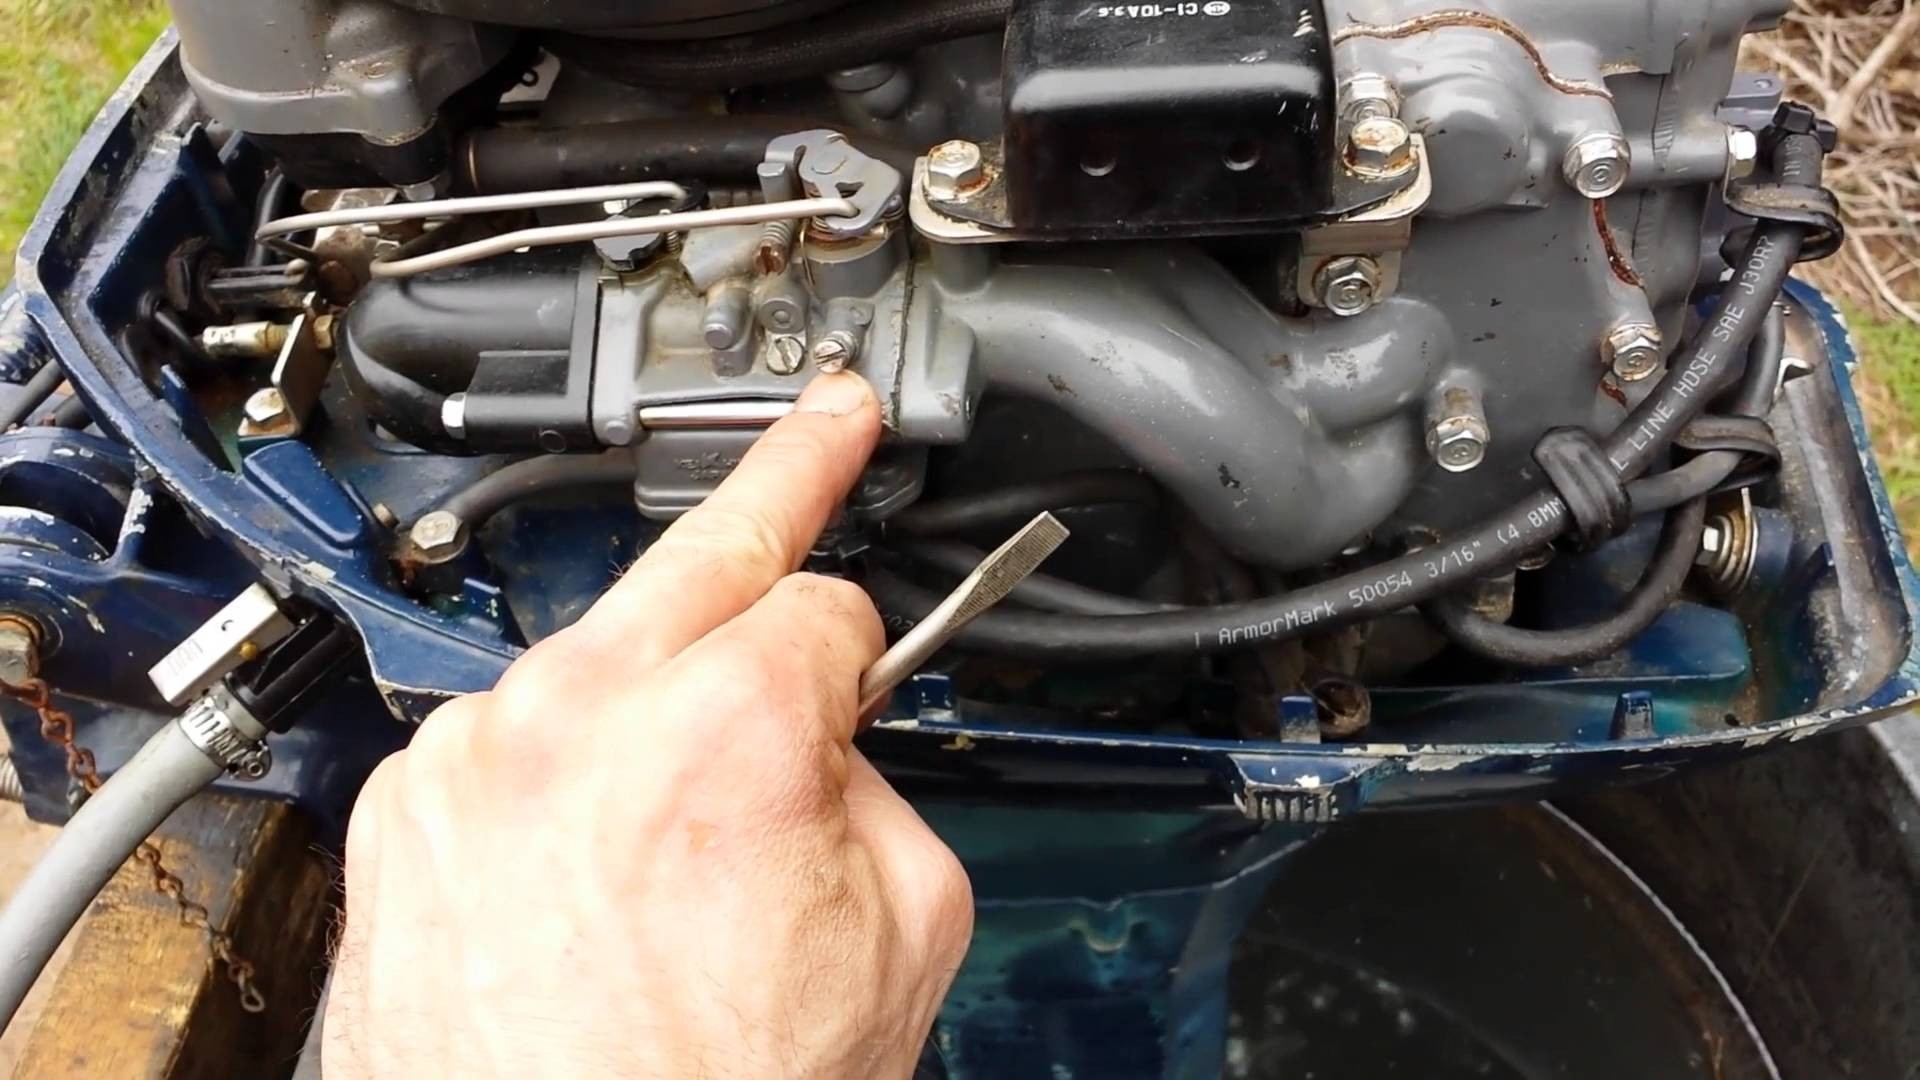 Honda Small Engine Carburetor Diagram 1983 Bf75l Honda 7 5hp Outboard after 2nd Carb Service Of Honda Small Engine Carburetor Diagram